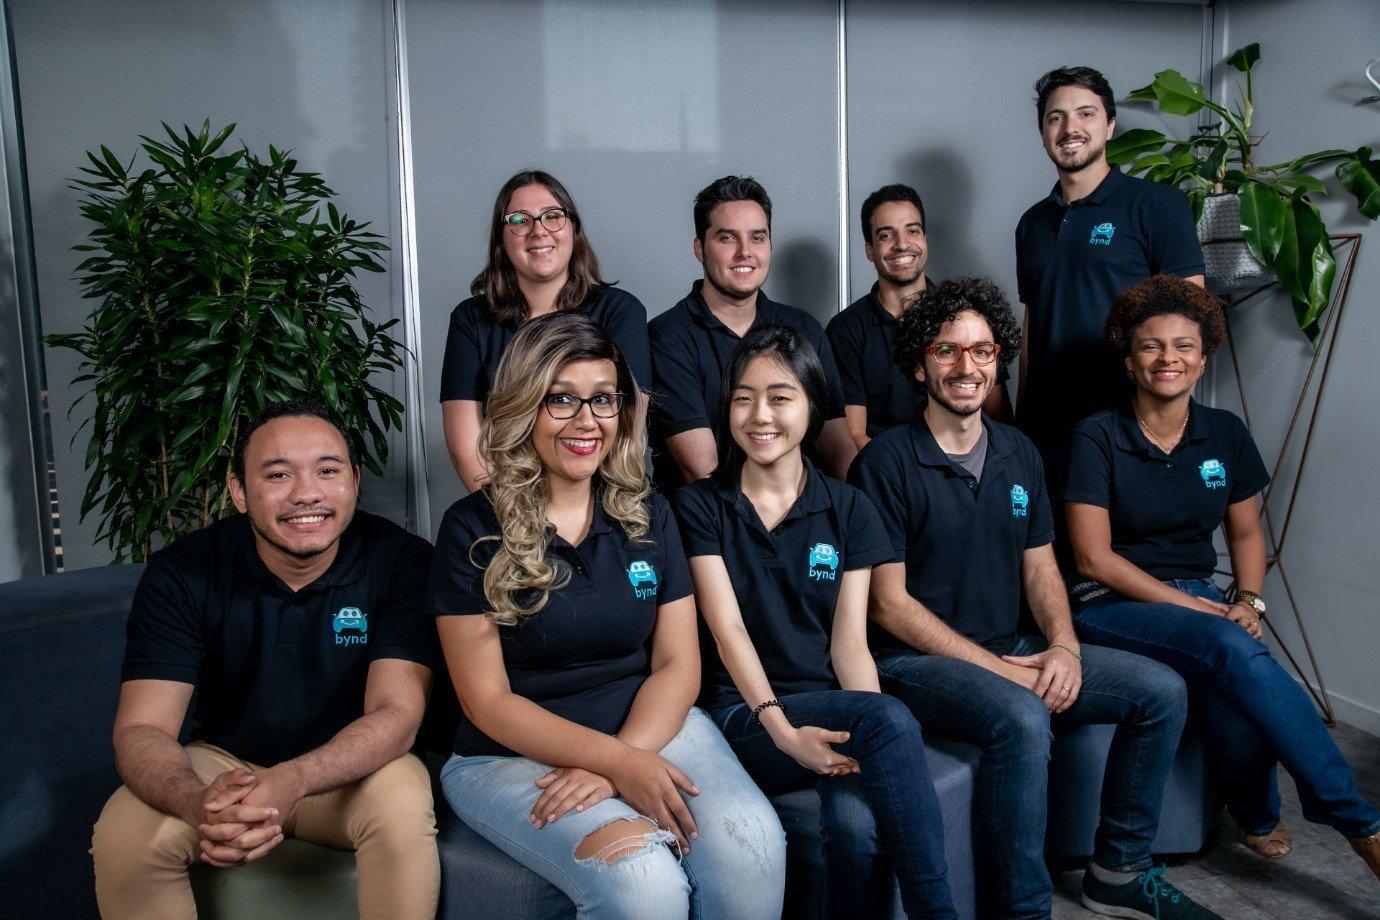 Equipe da startup Bynd